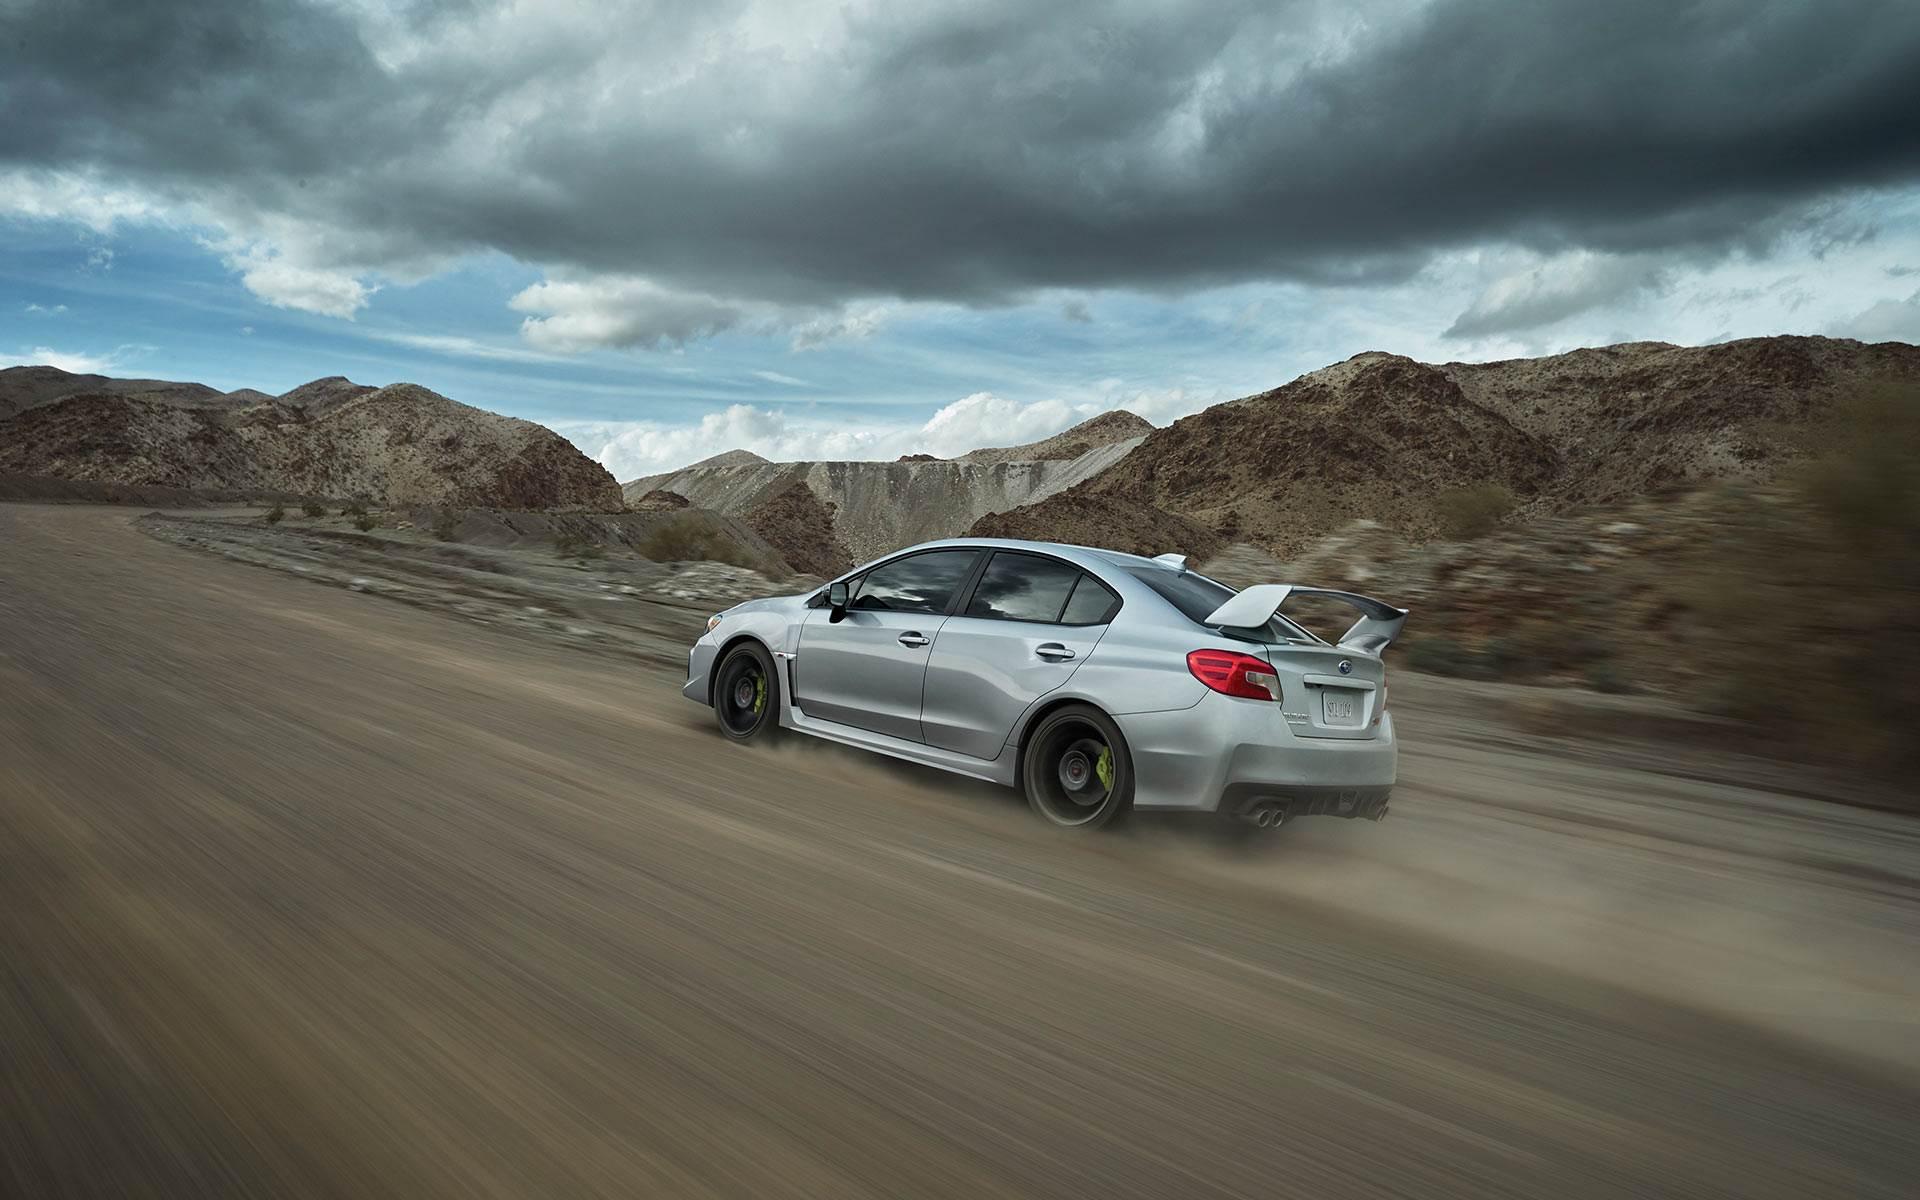 2018 Subaru Wrx Sti In Reno Michael Hohl Subaru